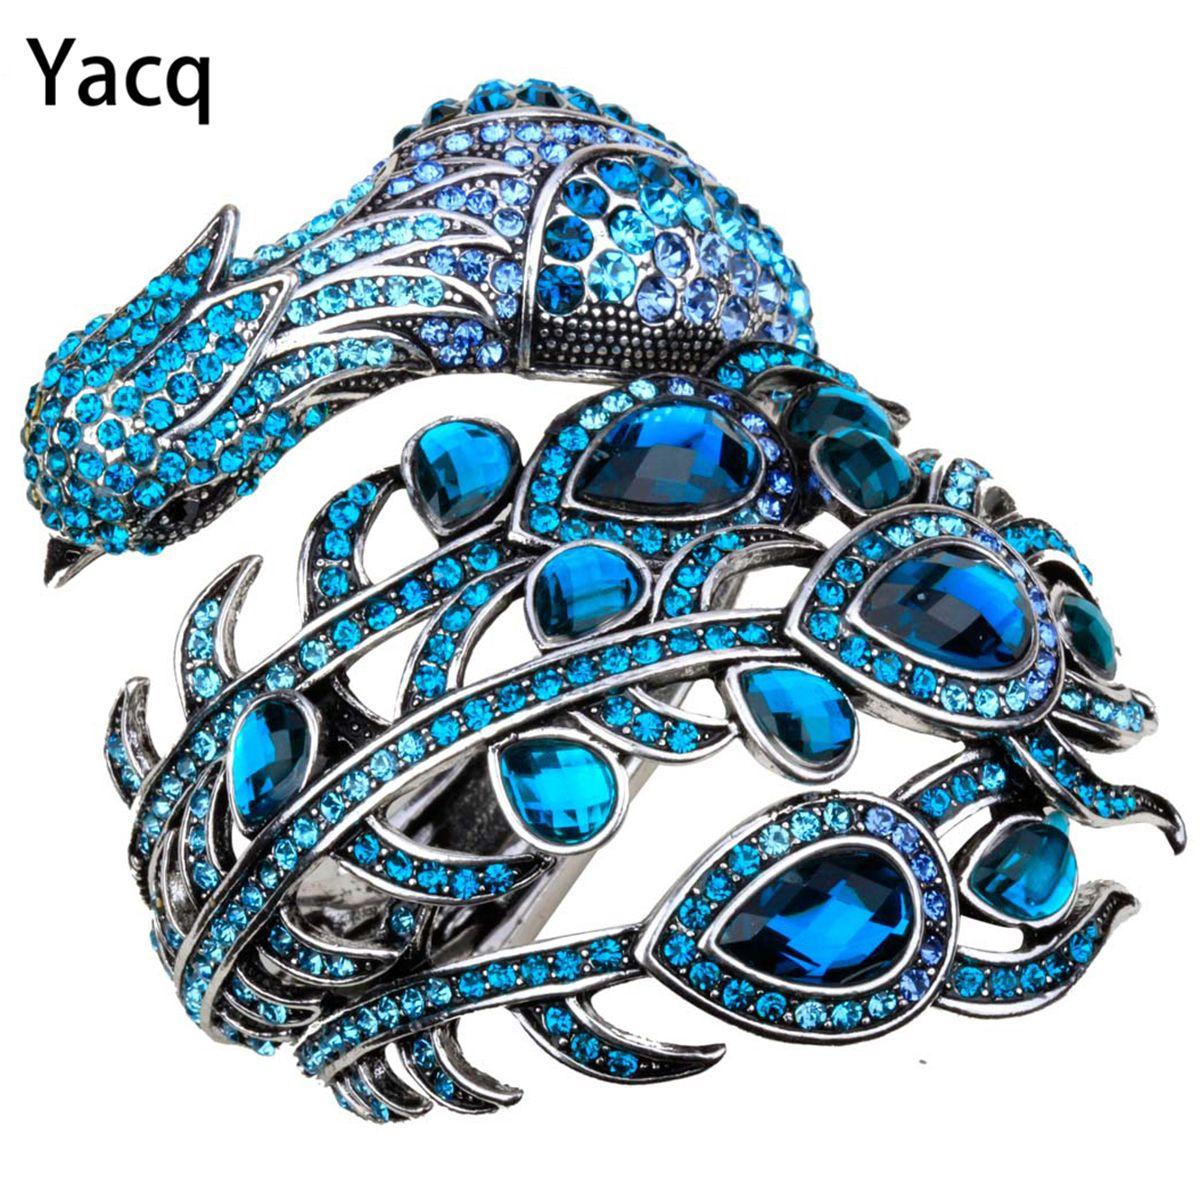 YACQ Peacock Bracelet Women <font><b>Crystal</b></font> Bangle Cuff Punk Rock Fashion Jewelry Gifts for Girlfriend Wife Her Mom A29 Dropshipping